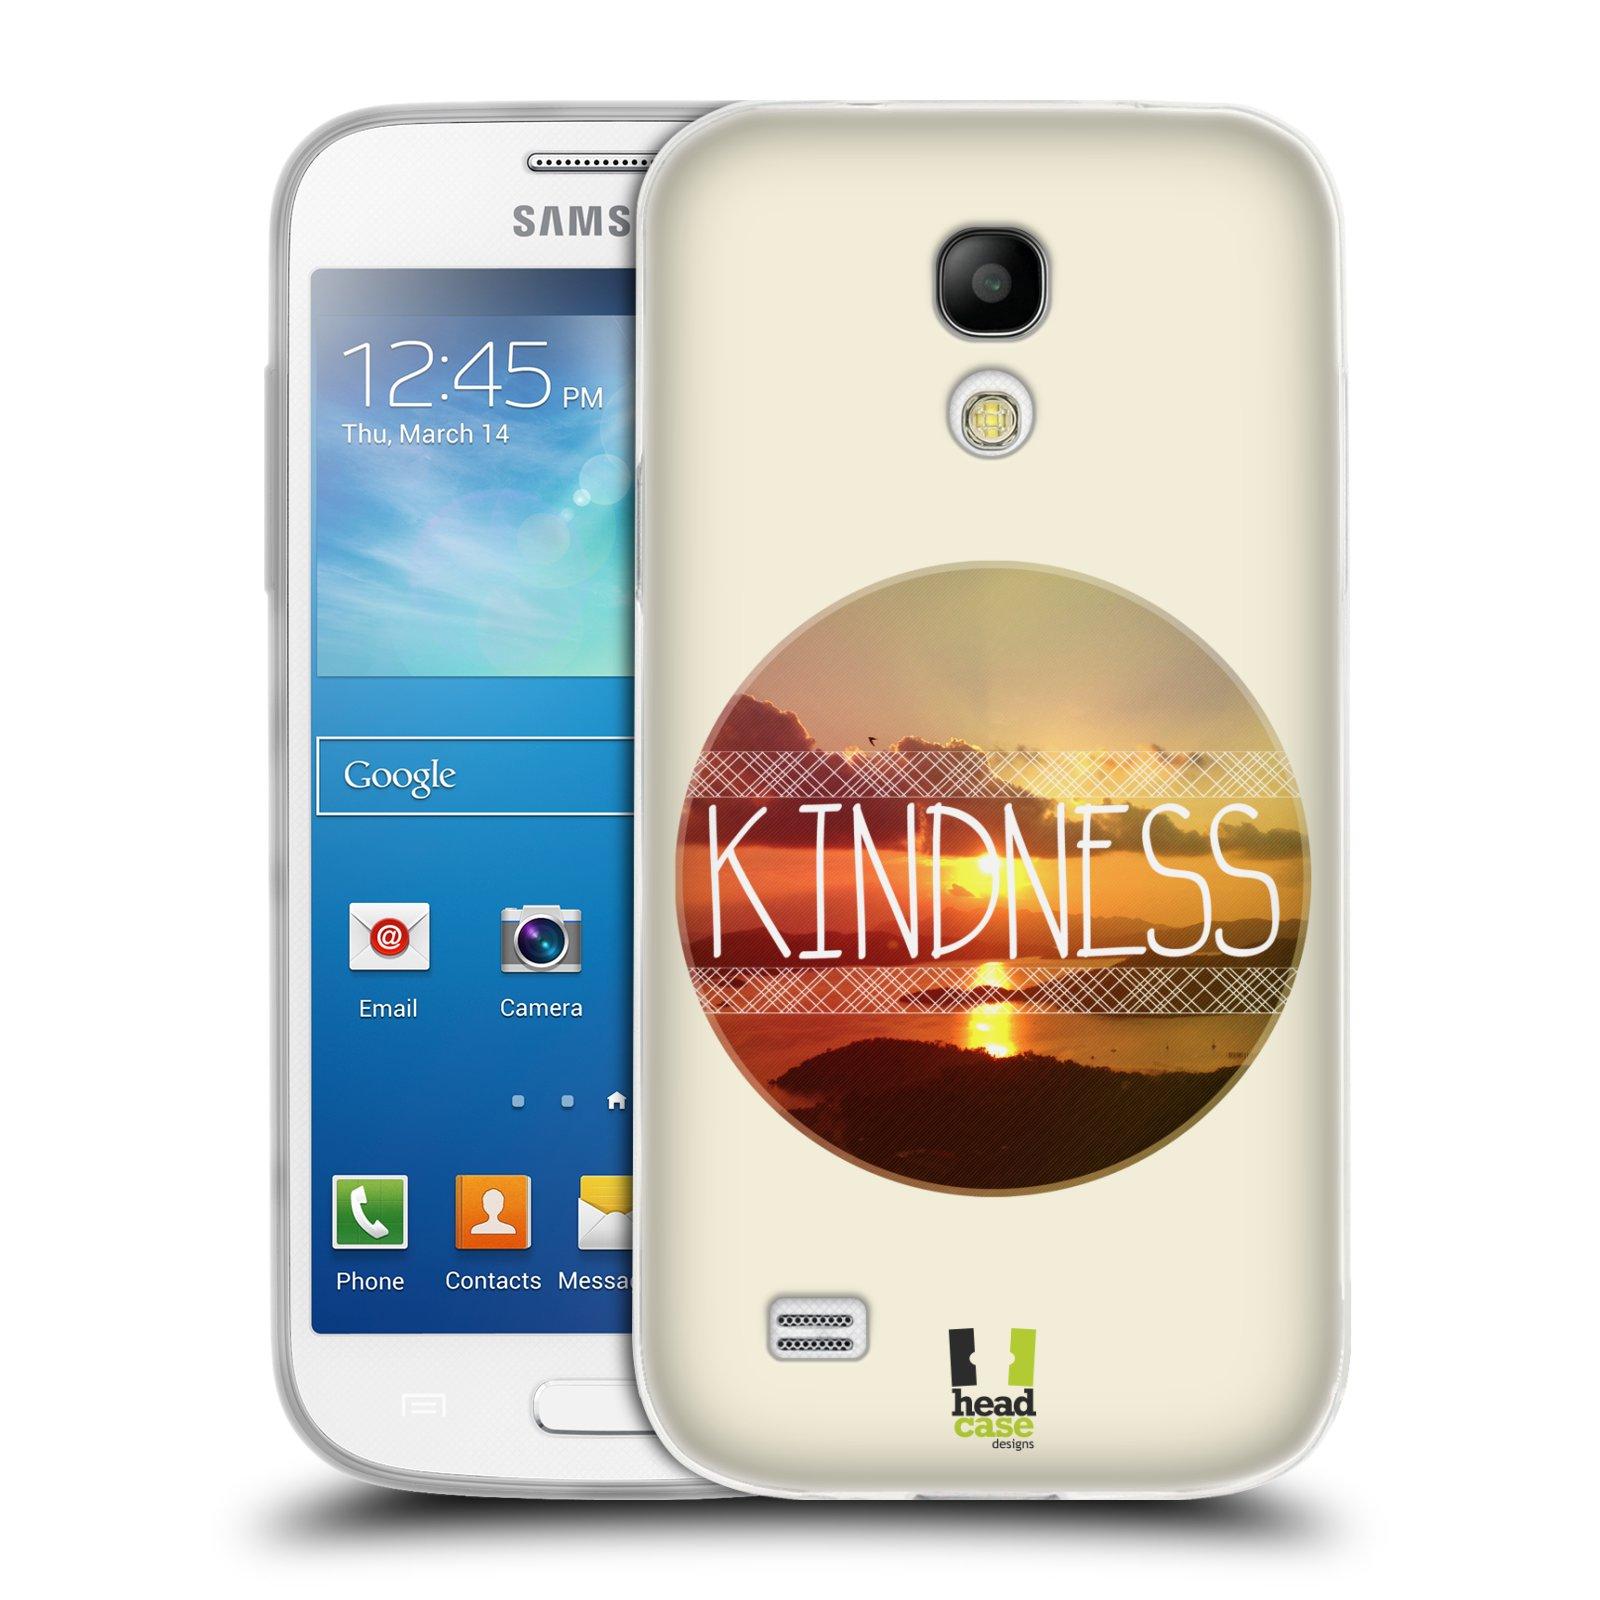 Silikonové pouzdro na mobil Samsung Galaxy S4 Mini HEAD CASE INSPIRACE V KRUHU LASKAVOST (Silikonový kryt či obal na mobilní telefon Samsung Galaxy S4 Mini GT-i9195 / i9190 (nepasuje na verzi Black Edition))